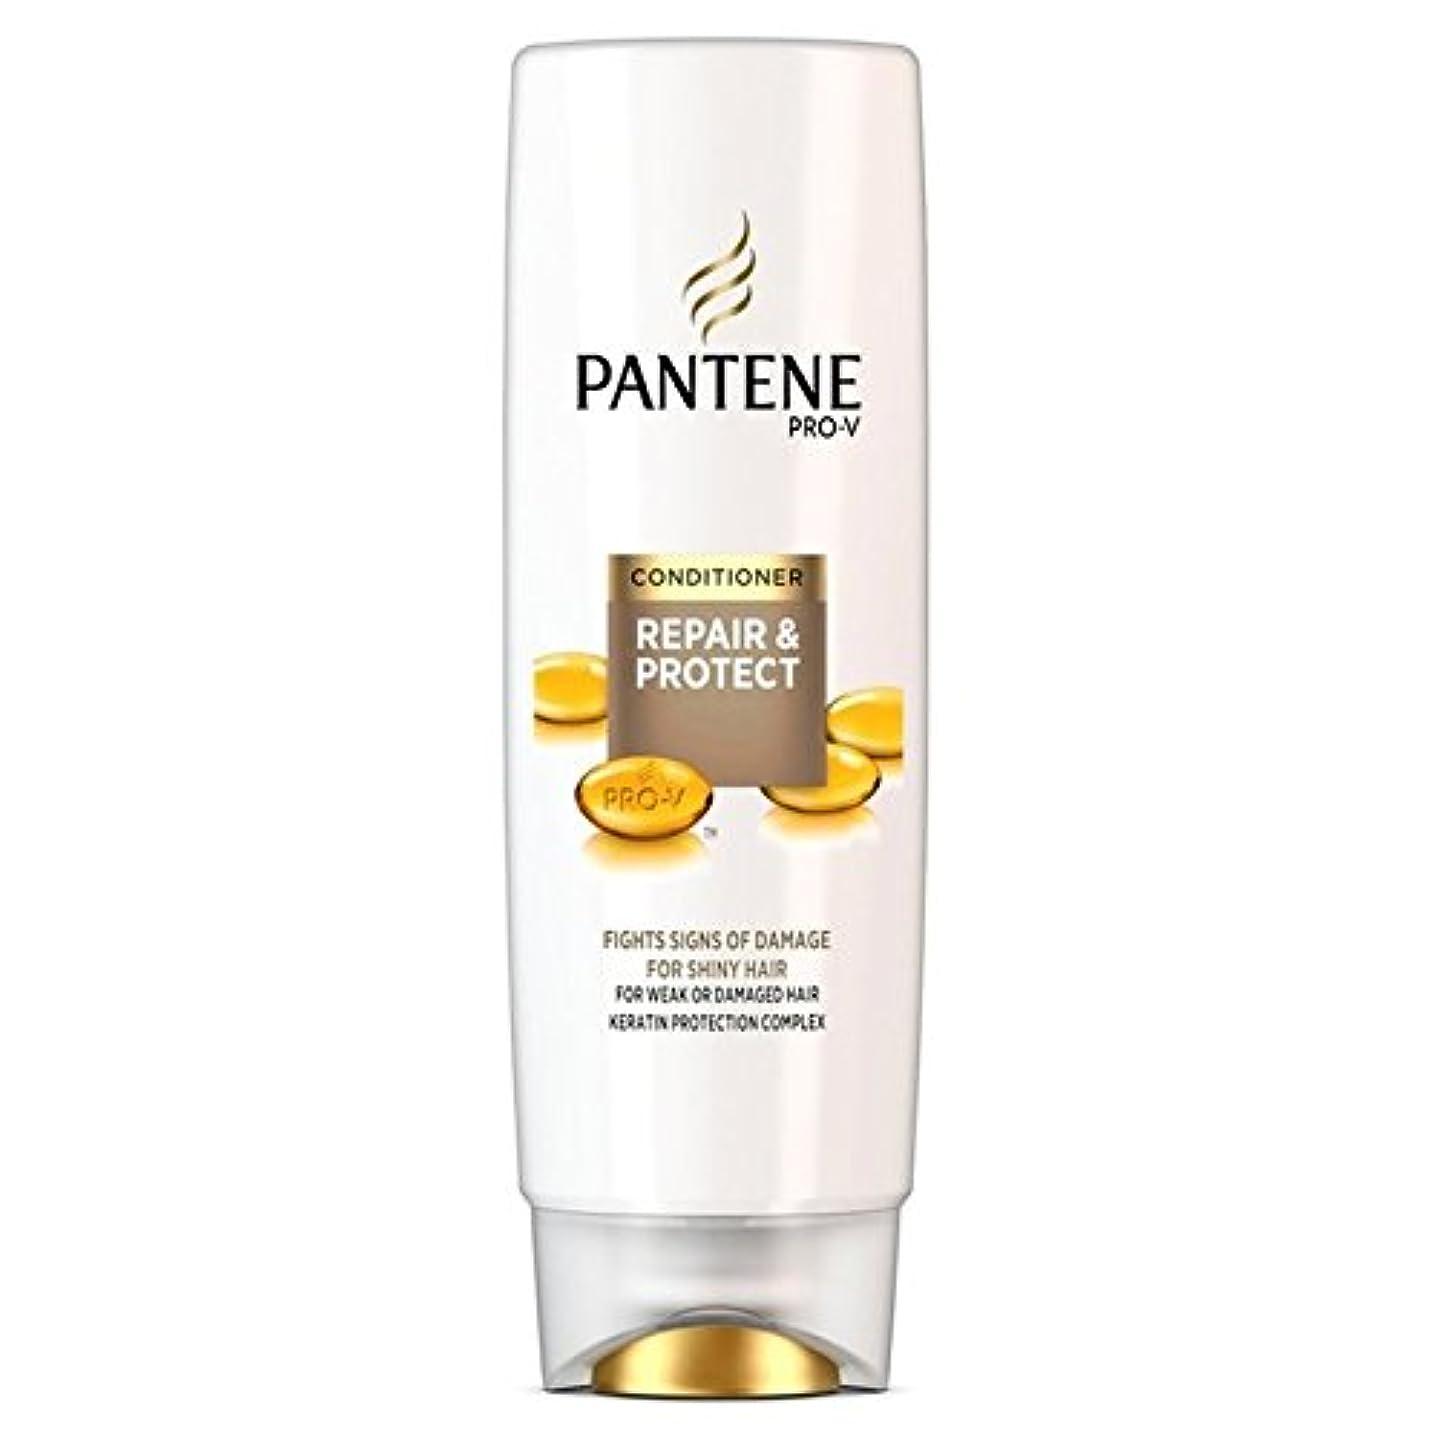 Pantene Conditioner Repair & Protect For Weak Or Damaged Hair 250ml (Pack of 6) - パンテーンコンディショナーの修理&弱いか、傷んだ髪の250...